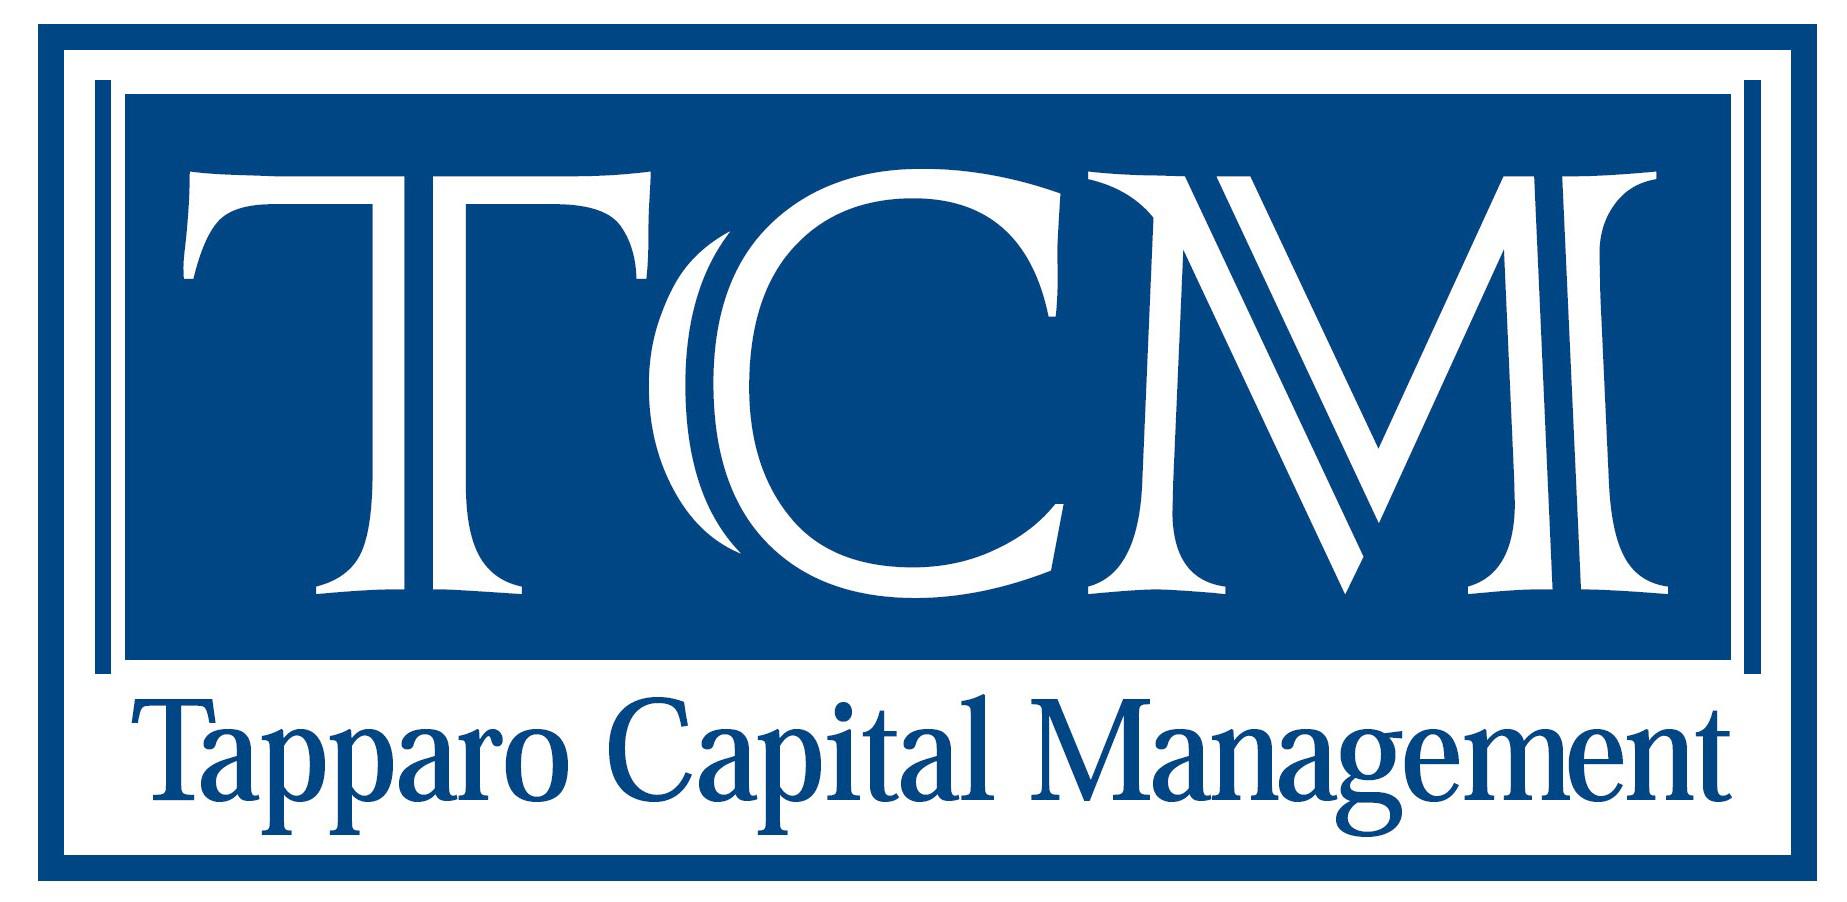 Tapparo Capital Management Middleton, MA Tapparo Capital Management